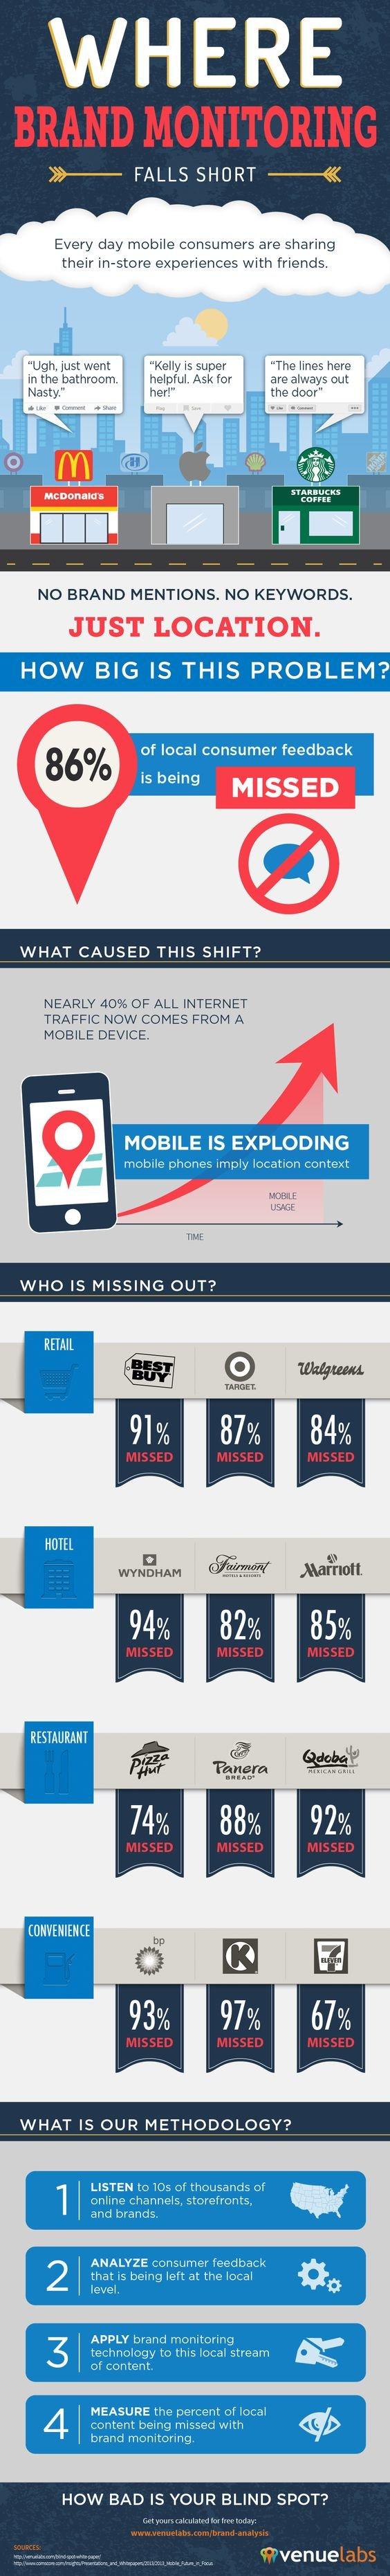 Where Brand Social Media Monitoring falls short #SMM #Infographic